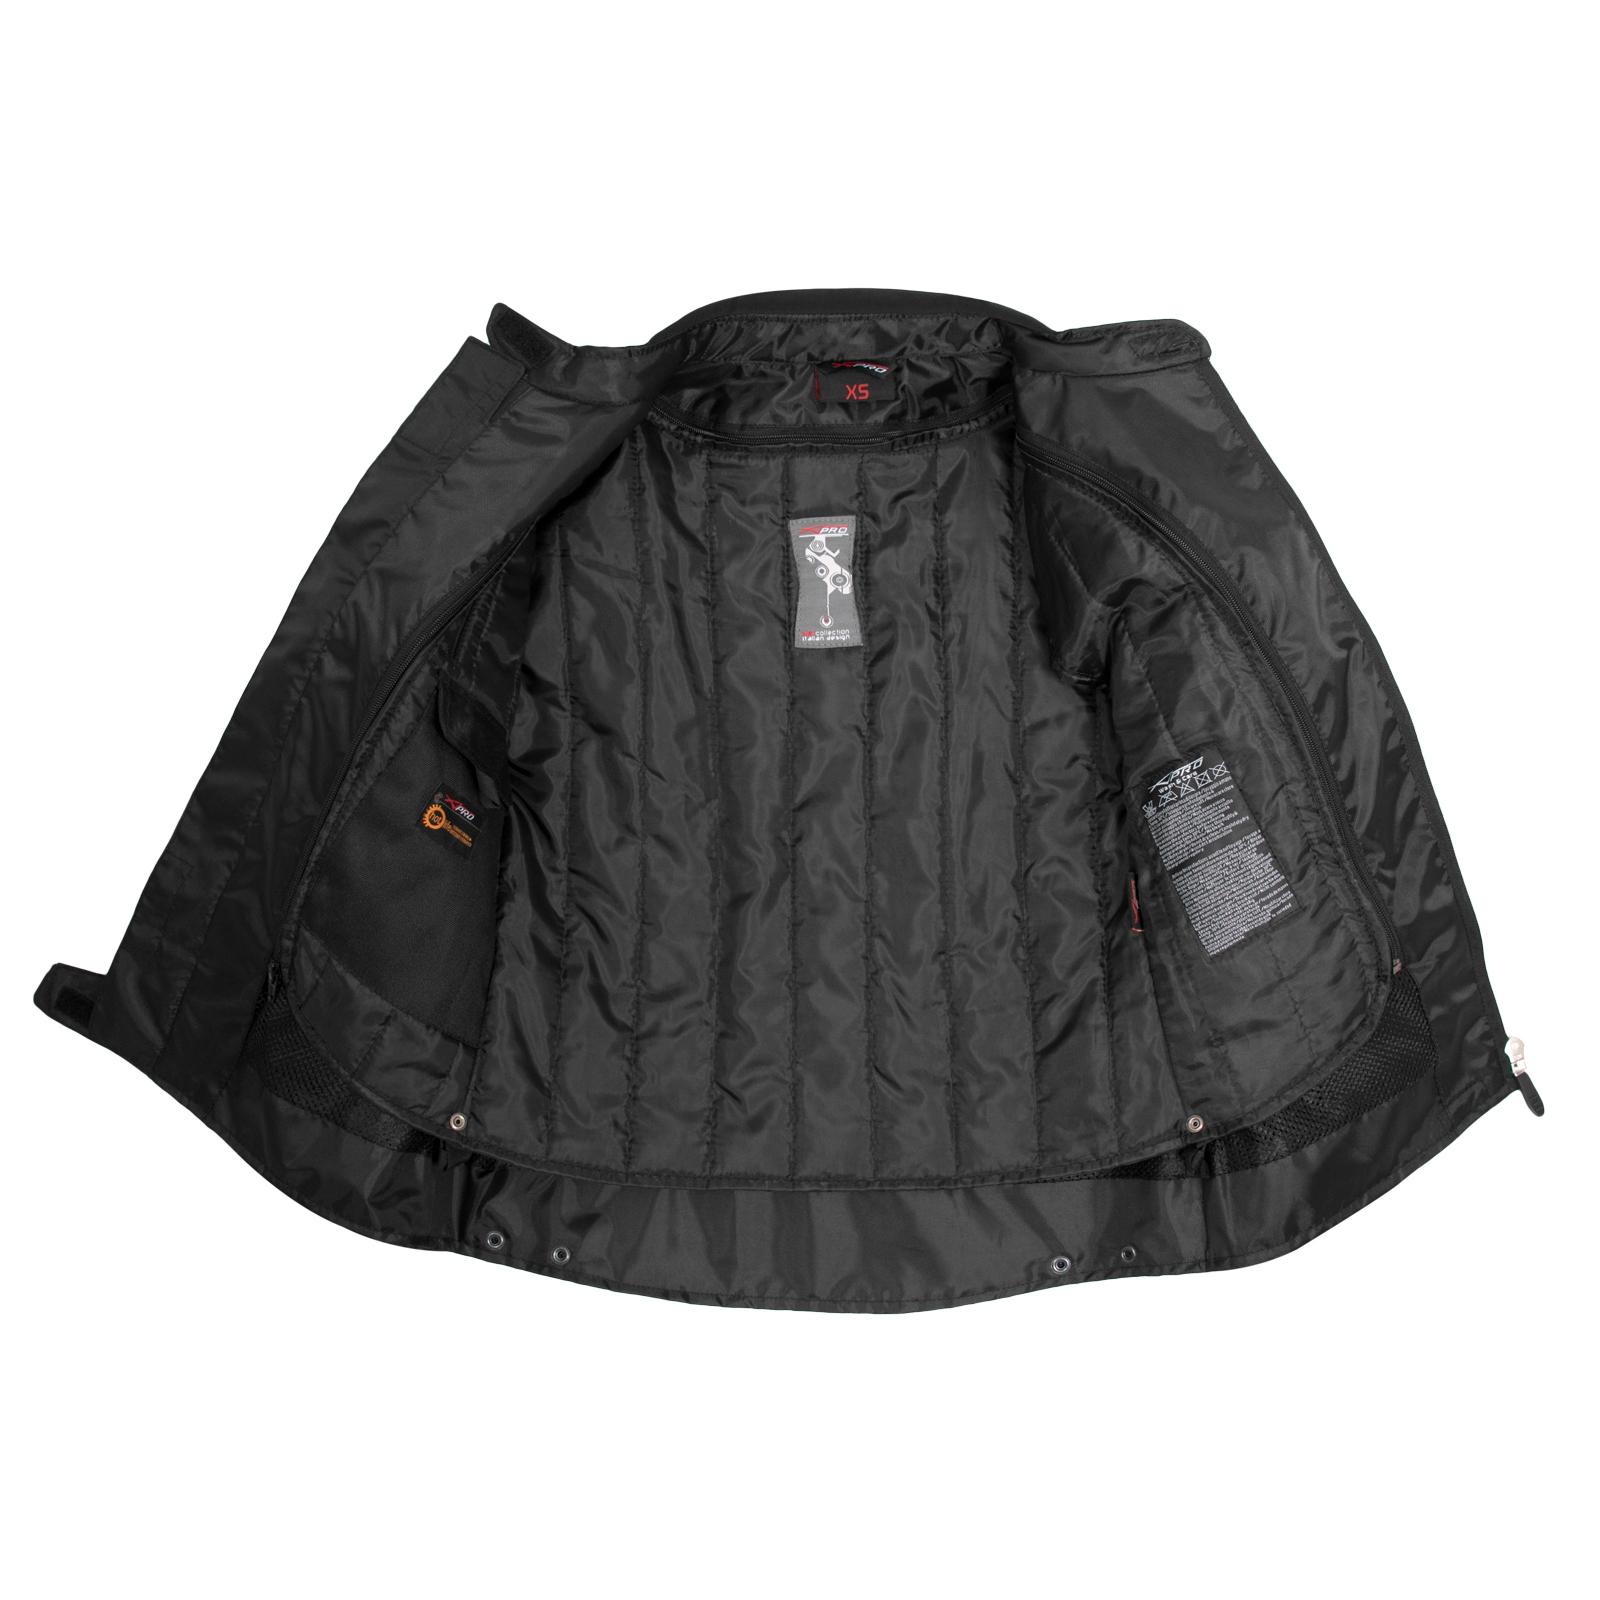 miniatuur 17 - Giacca-Lady-Moto-Donna-Tessuto-Protezioni-CE-Termico-Sfoderabile-Scooter